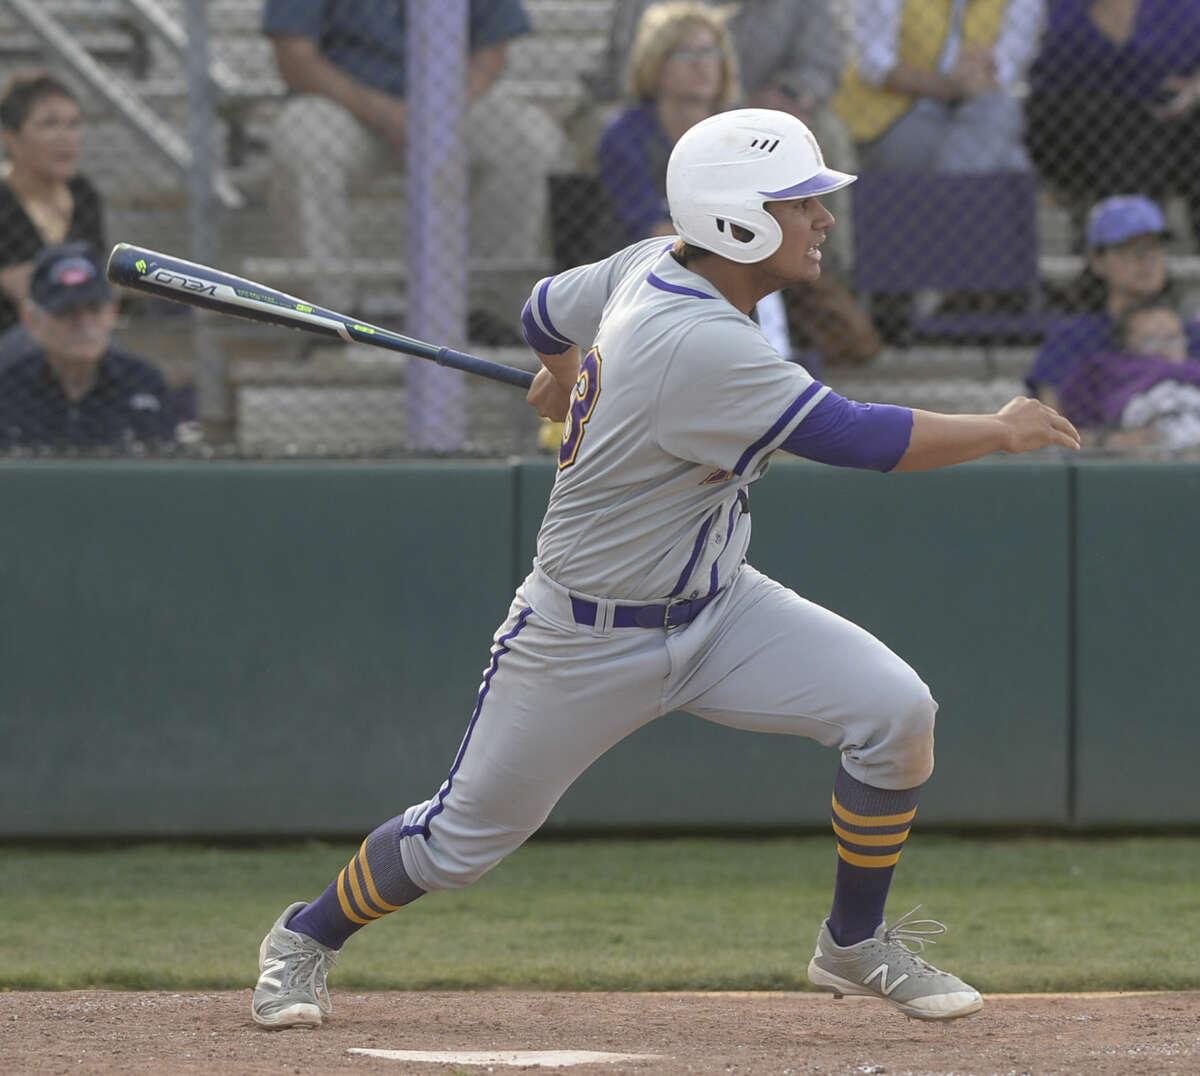 Midland High's Jacob Mata (13) hits against San Angelo on Tuesday, March 22, 2016, at Zachery Field. James Durbin/Reporter-Telegram